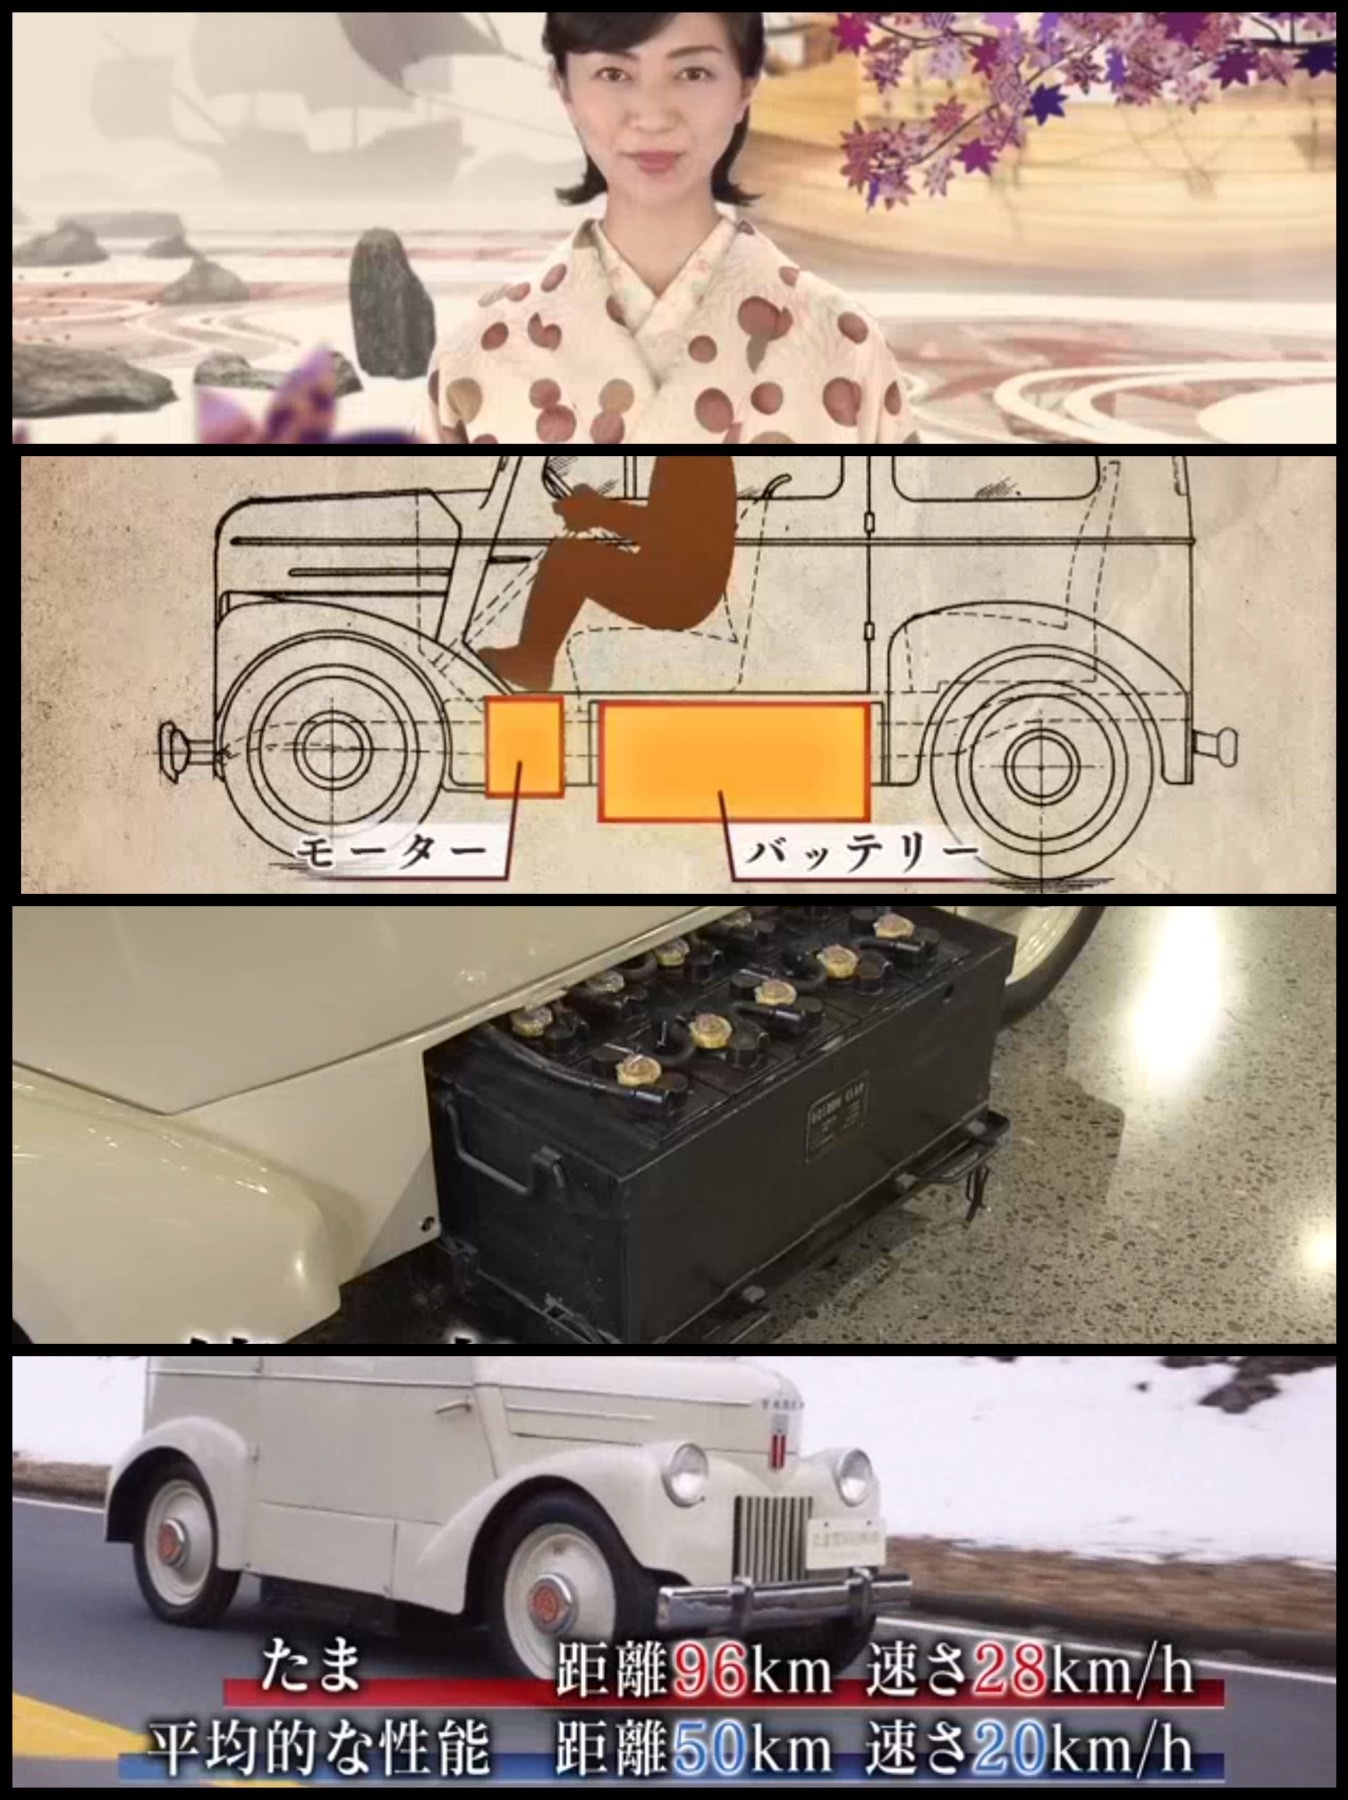 NHK 歴史秘話ヒストリア「走れ!たま 知られざる電気自動車の時代」を見てみた